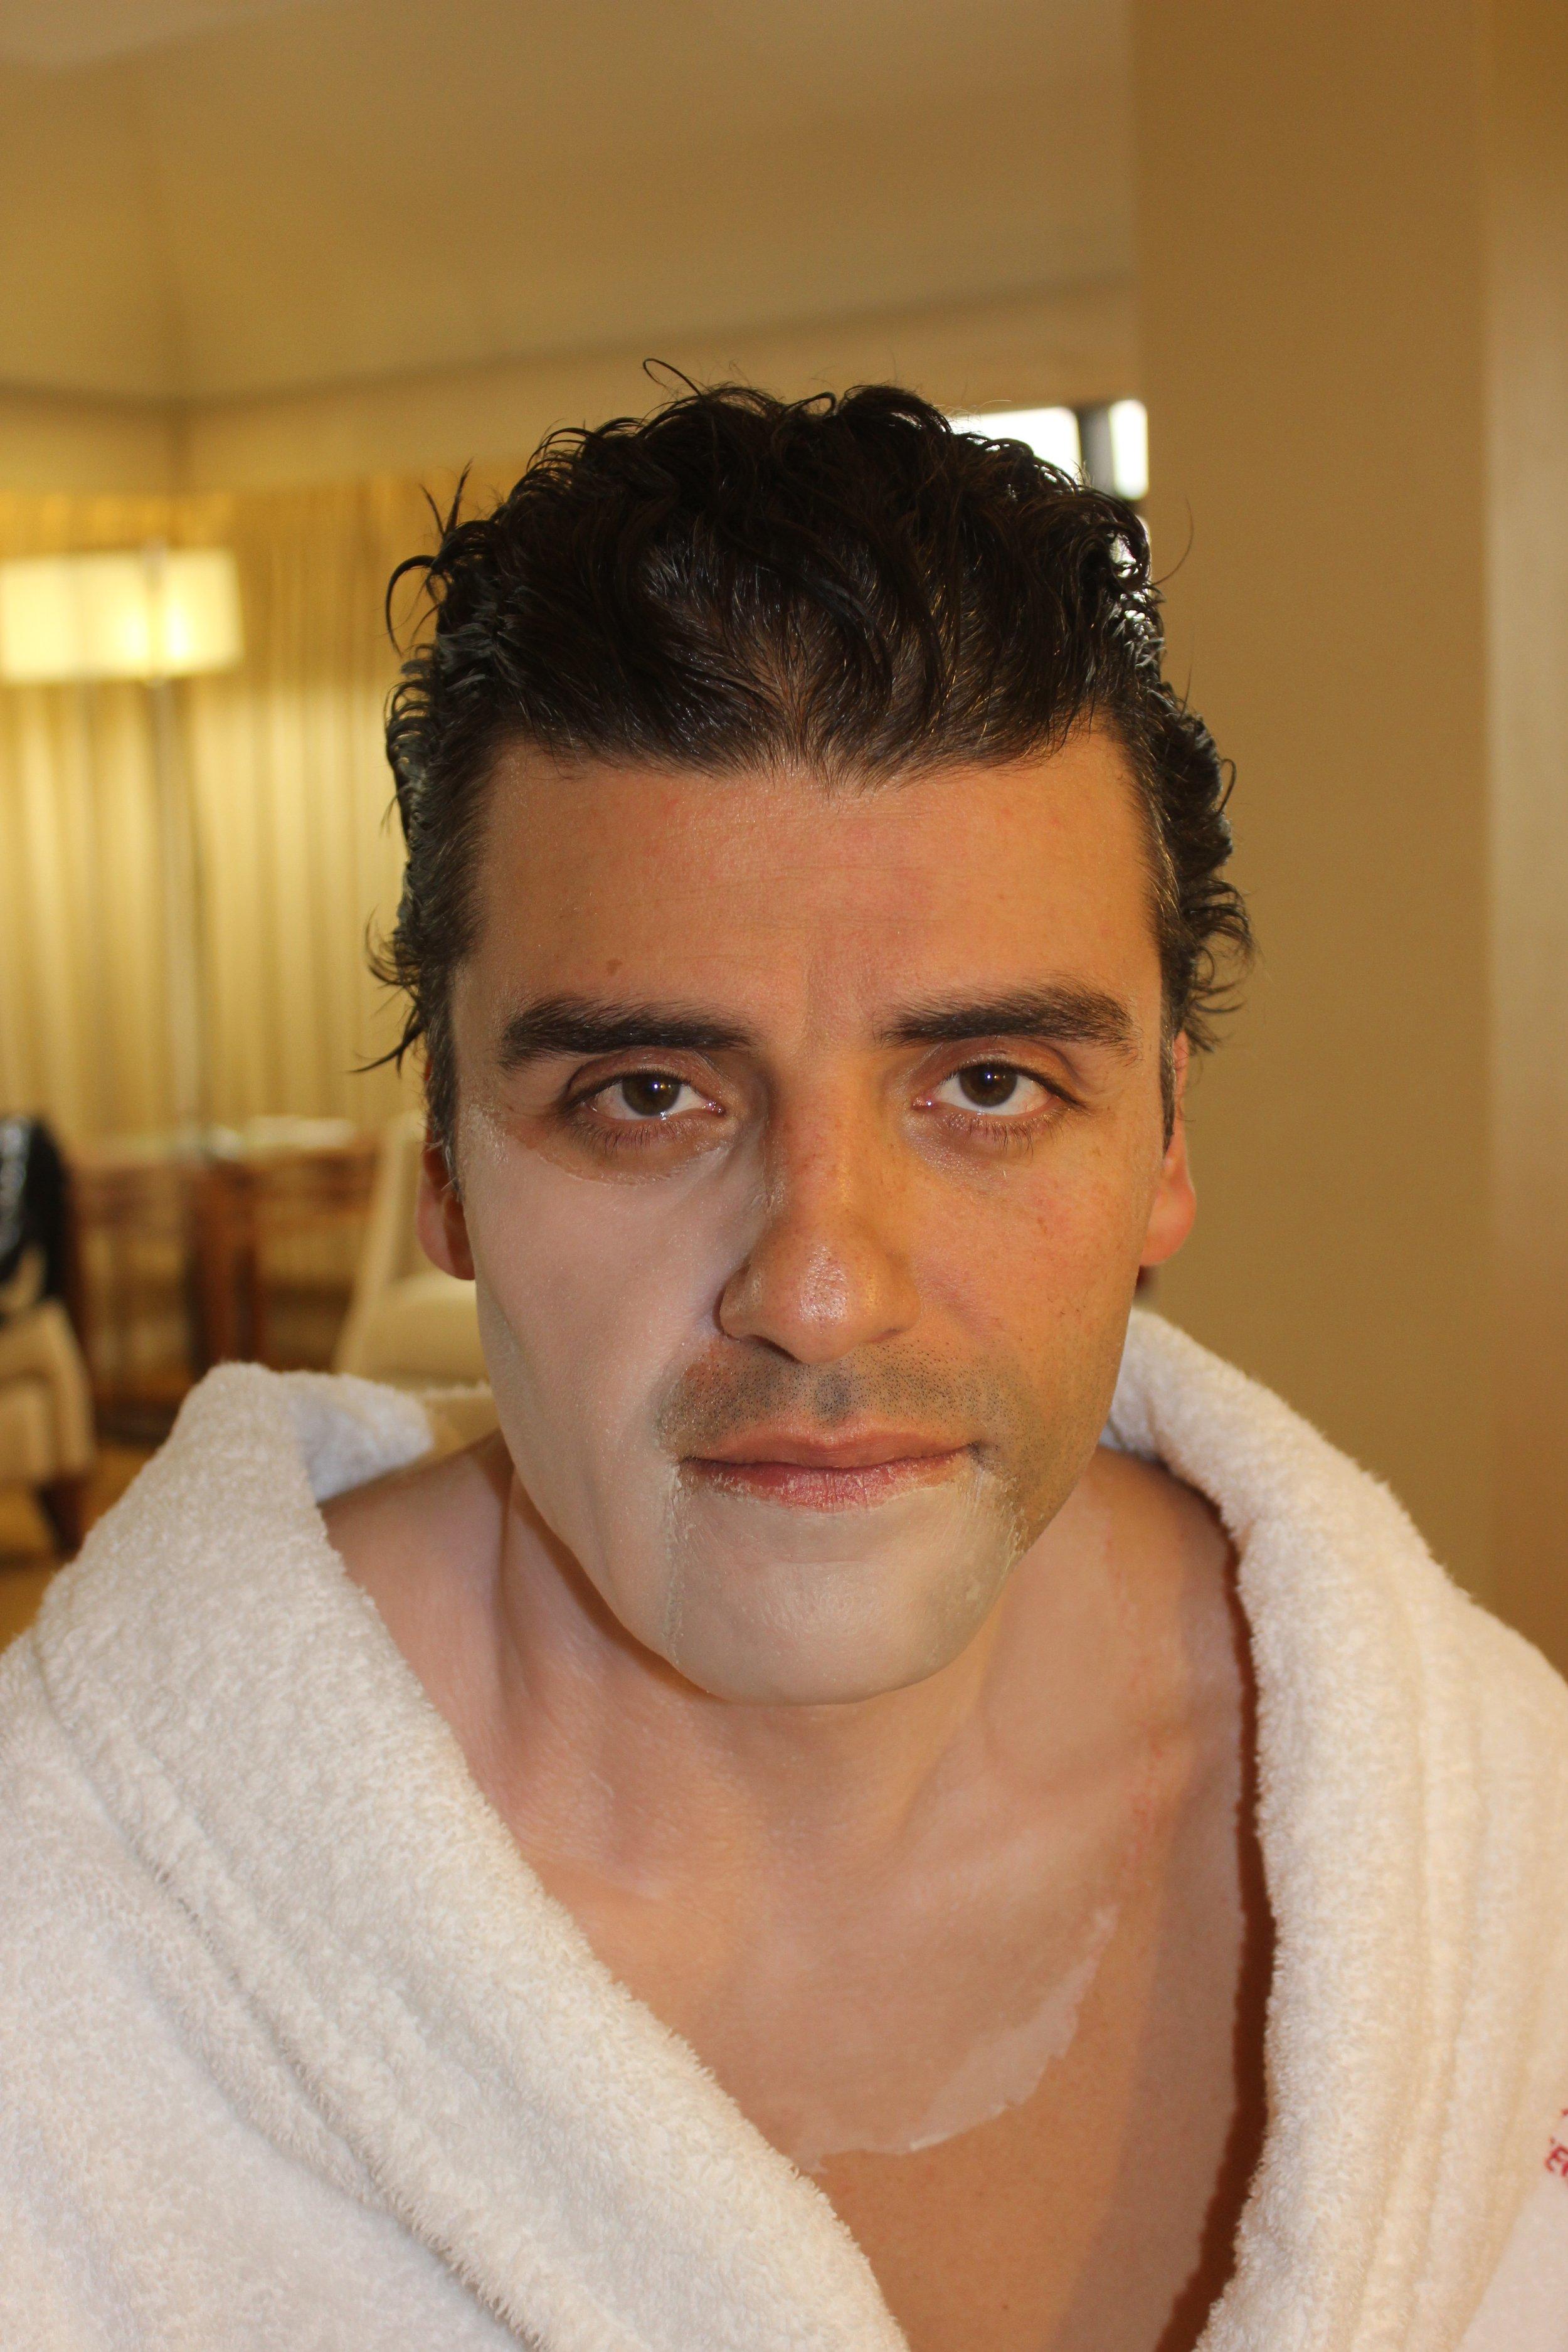 Oscar Makeup in Mid Process 01.jpg